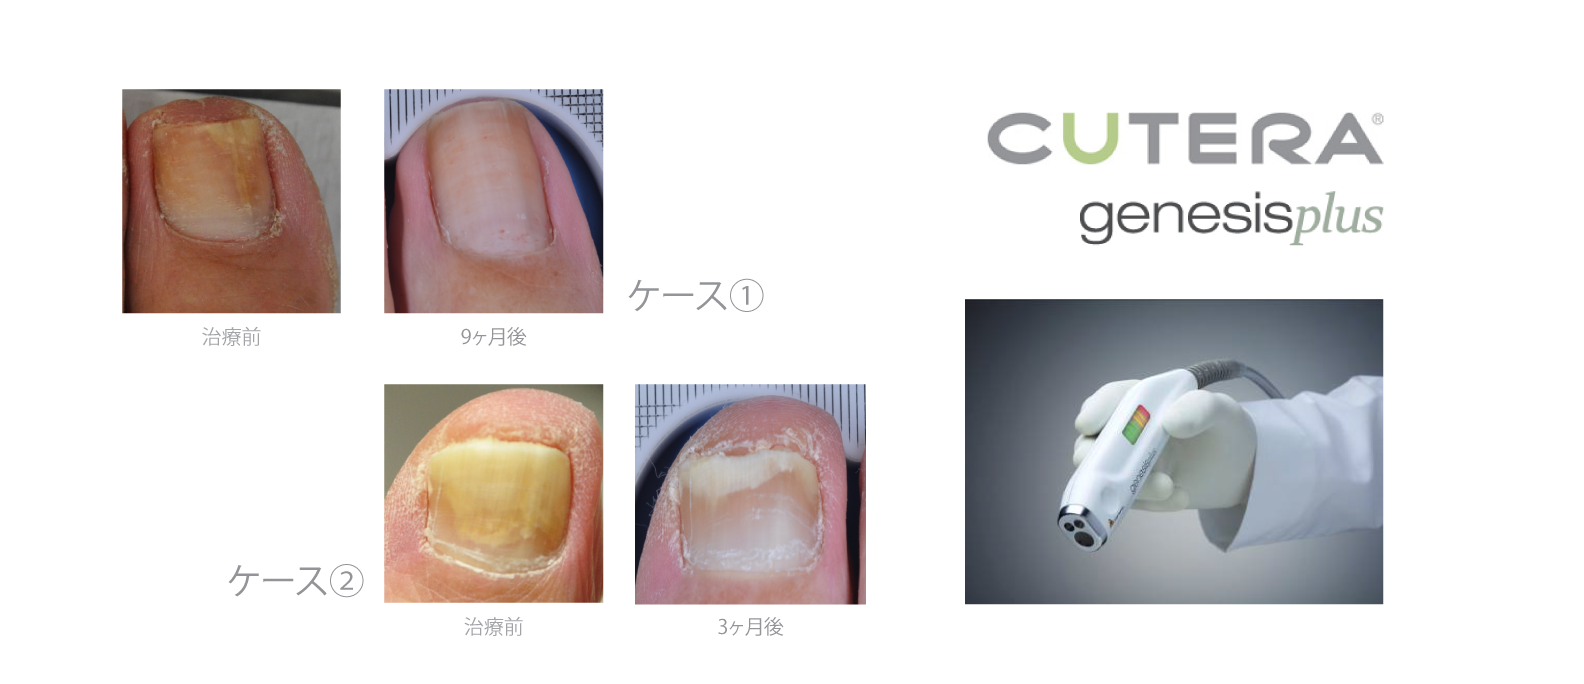 mika-hayashi-林美香足病科クリニック-laser-toenail-fungus-レーザー治療‐爪水虫2